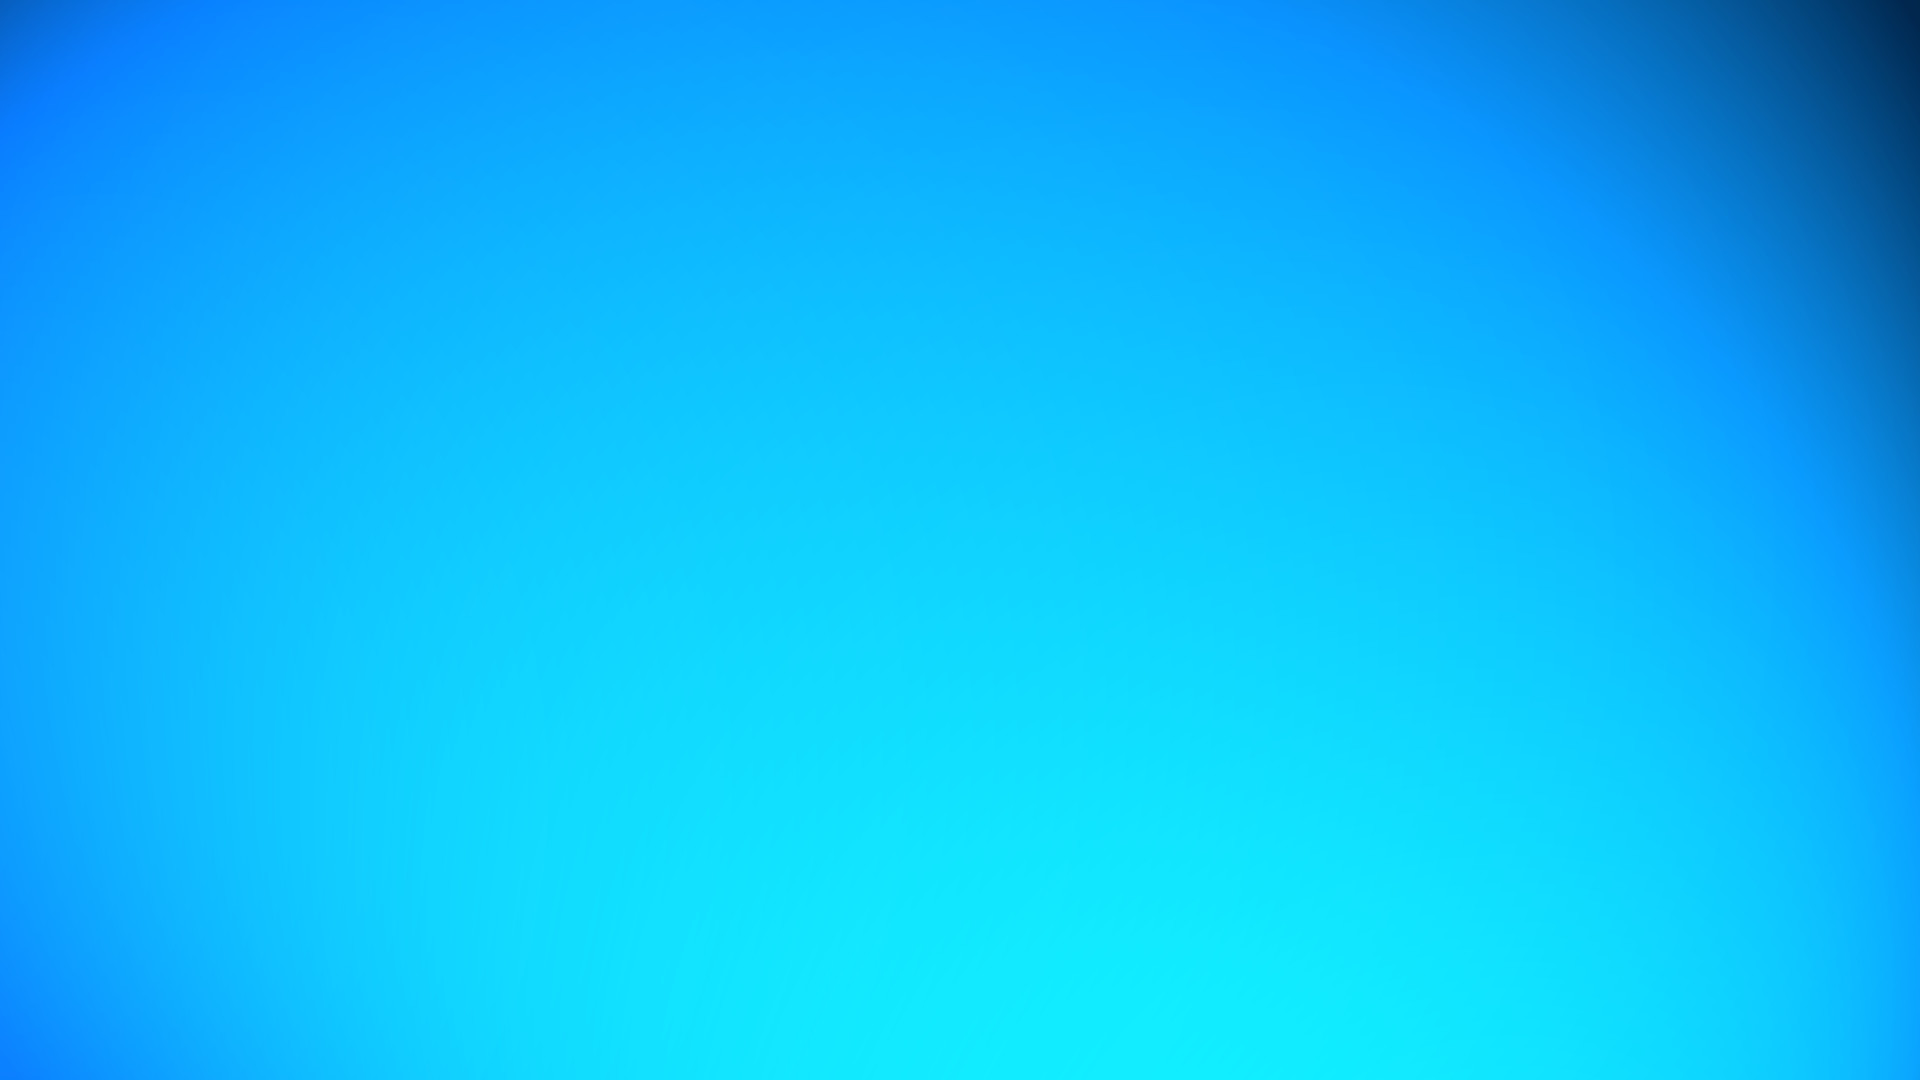 Color Gradient Wallpaper HD, Most Beautiful HDQ Color Gradient HD .